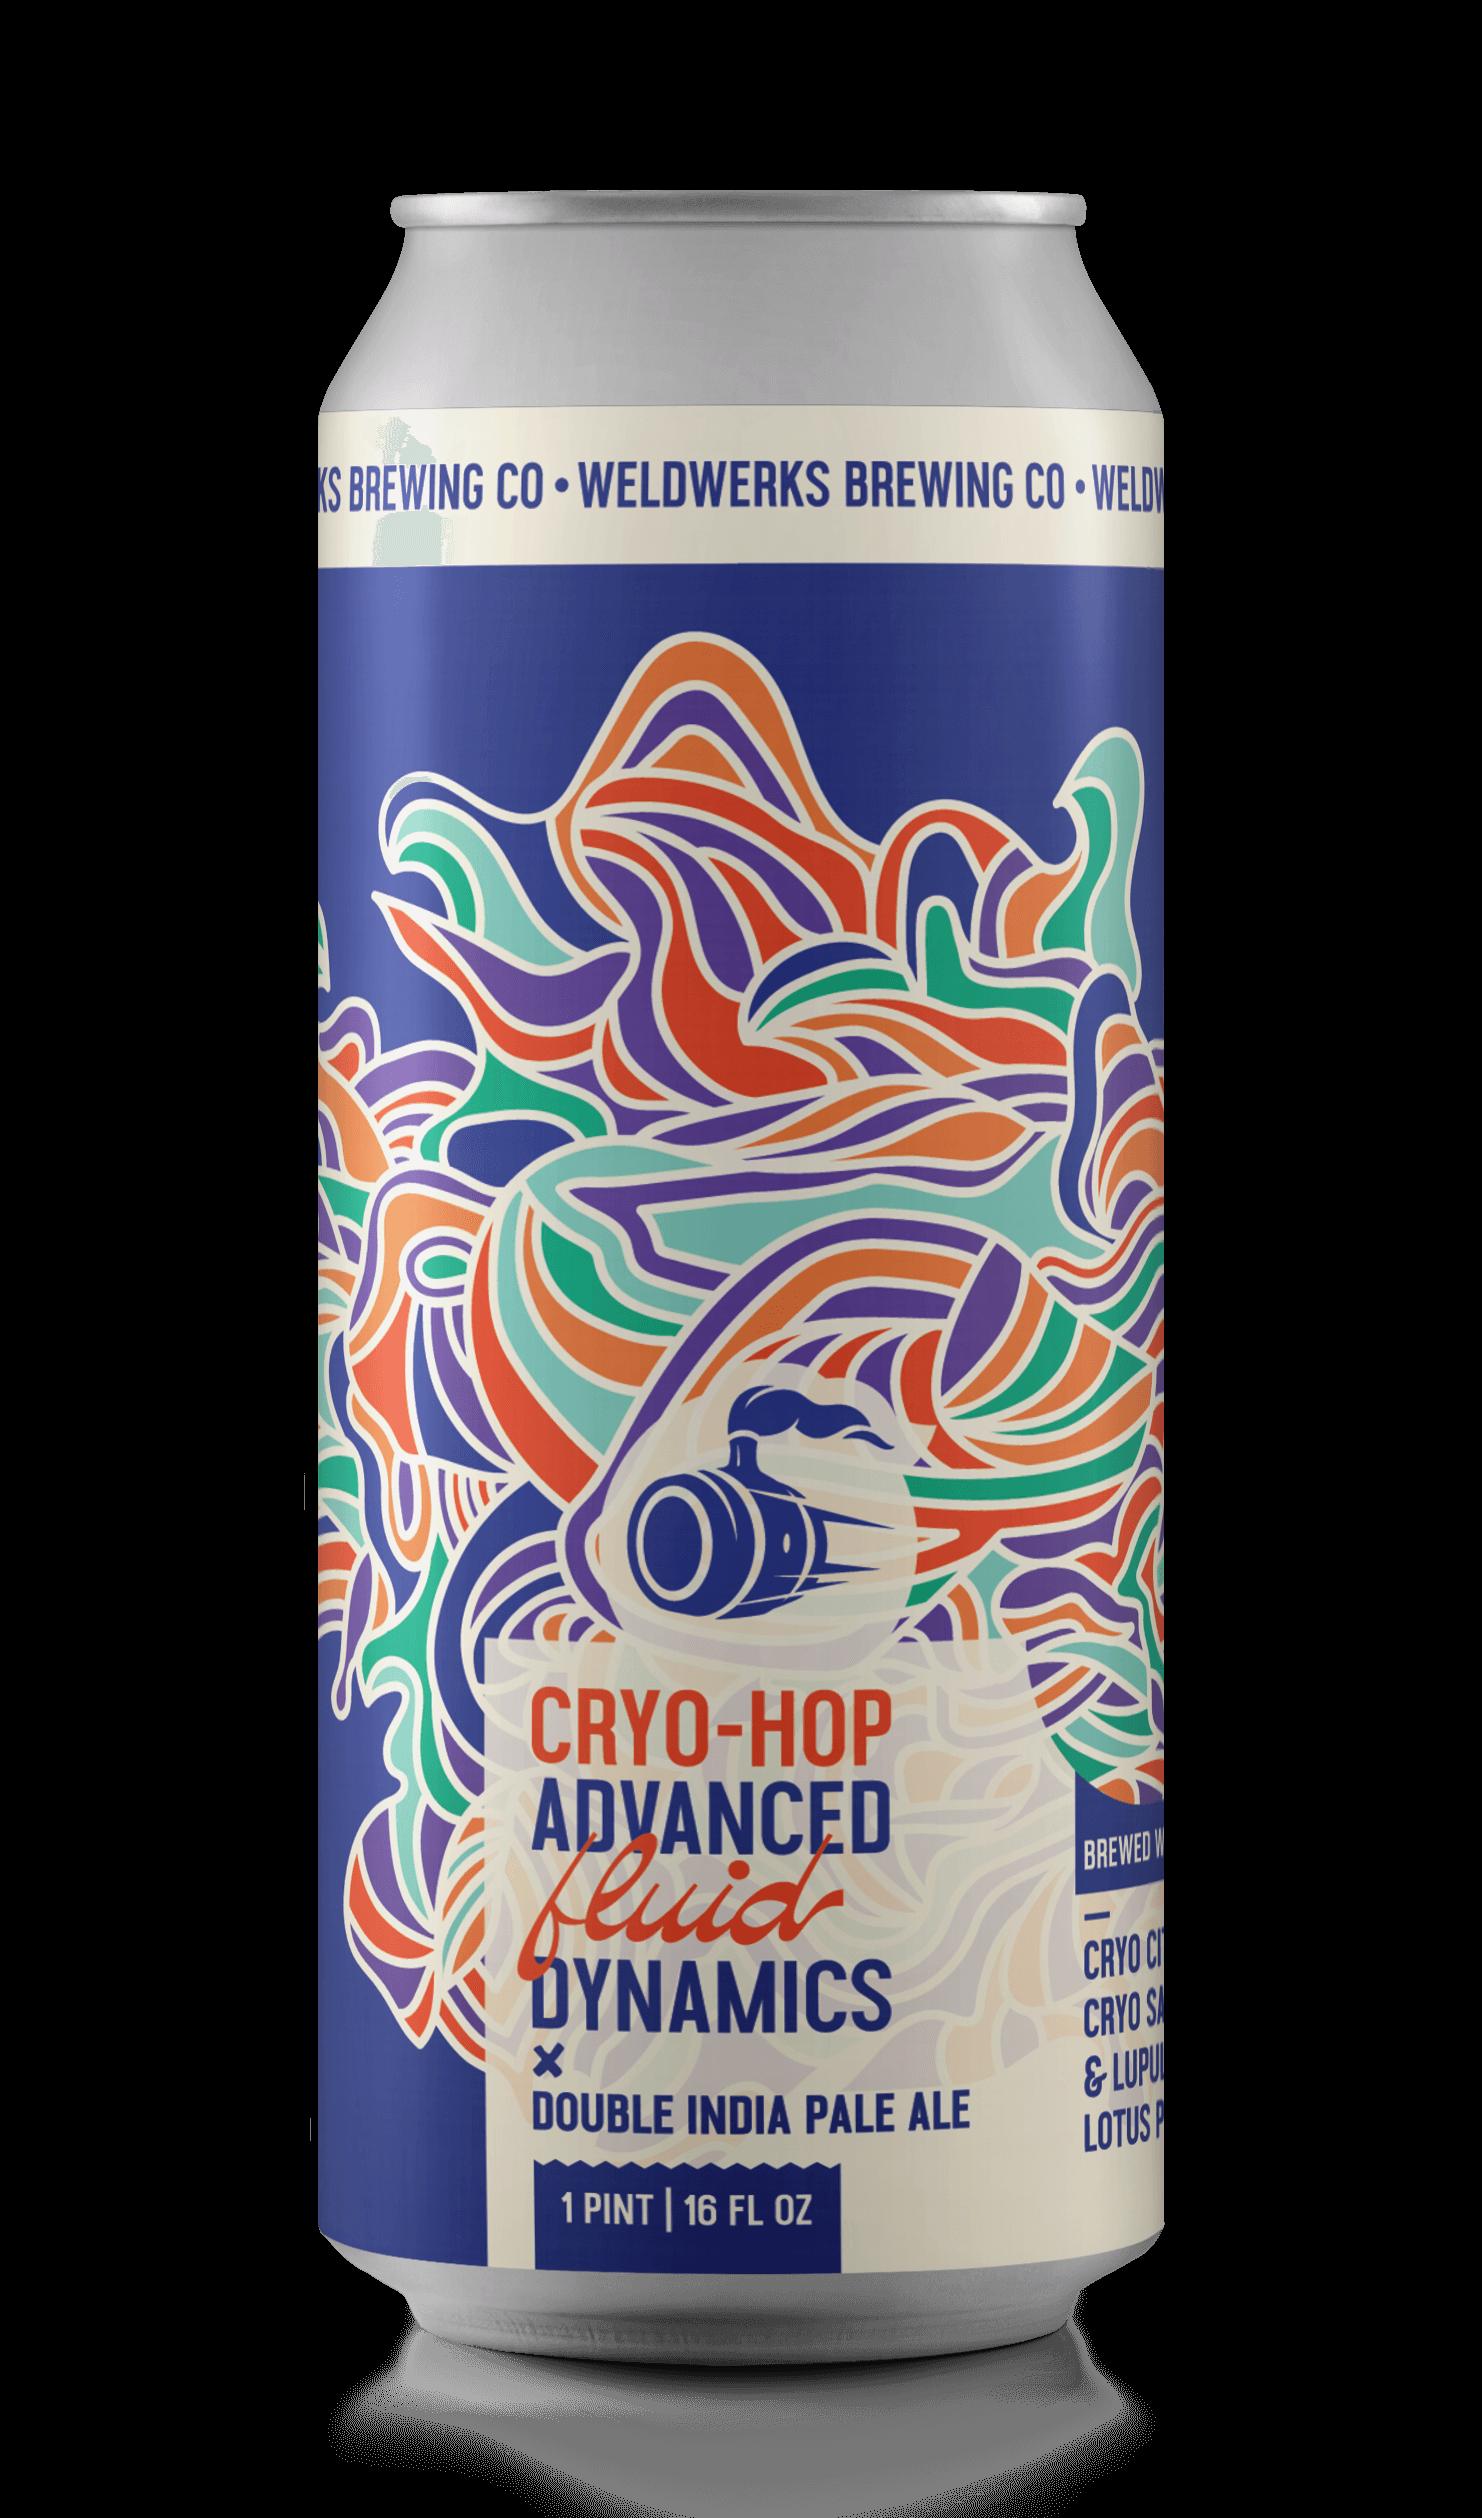 Cryo-Hop Advanced Fluid Dynamics